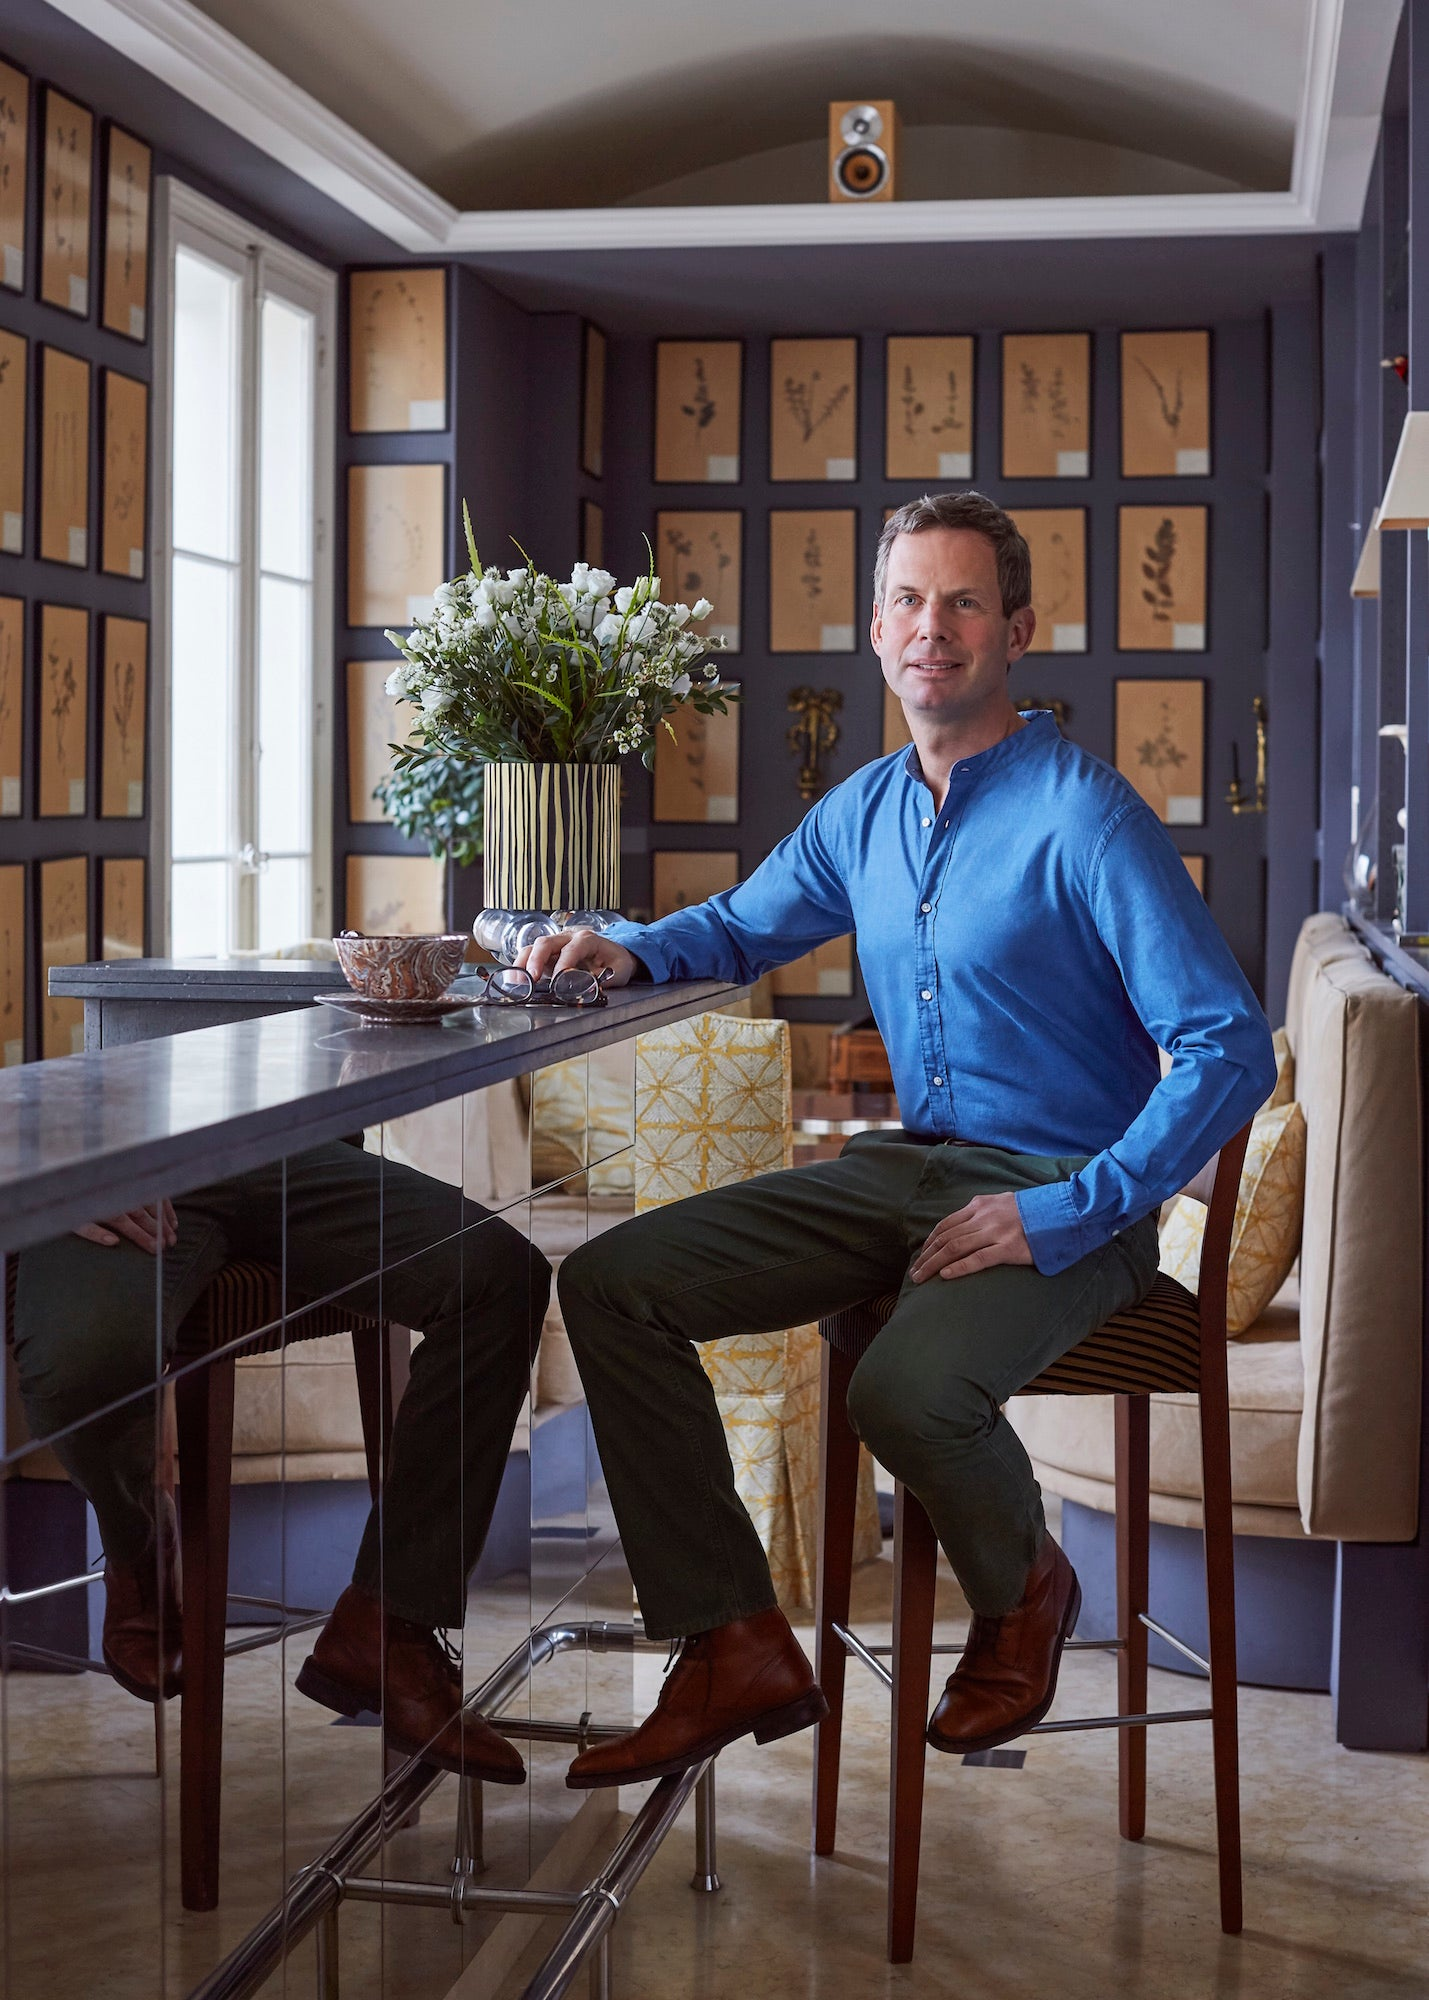 Jamie Creel in his Paris kitchen